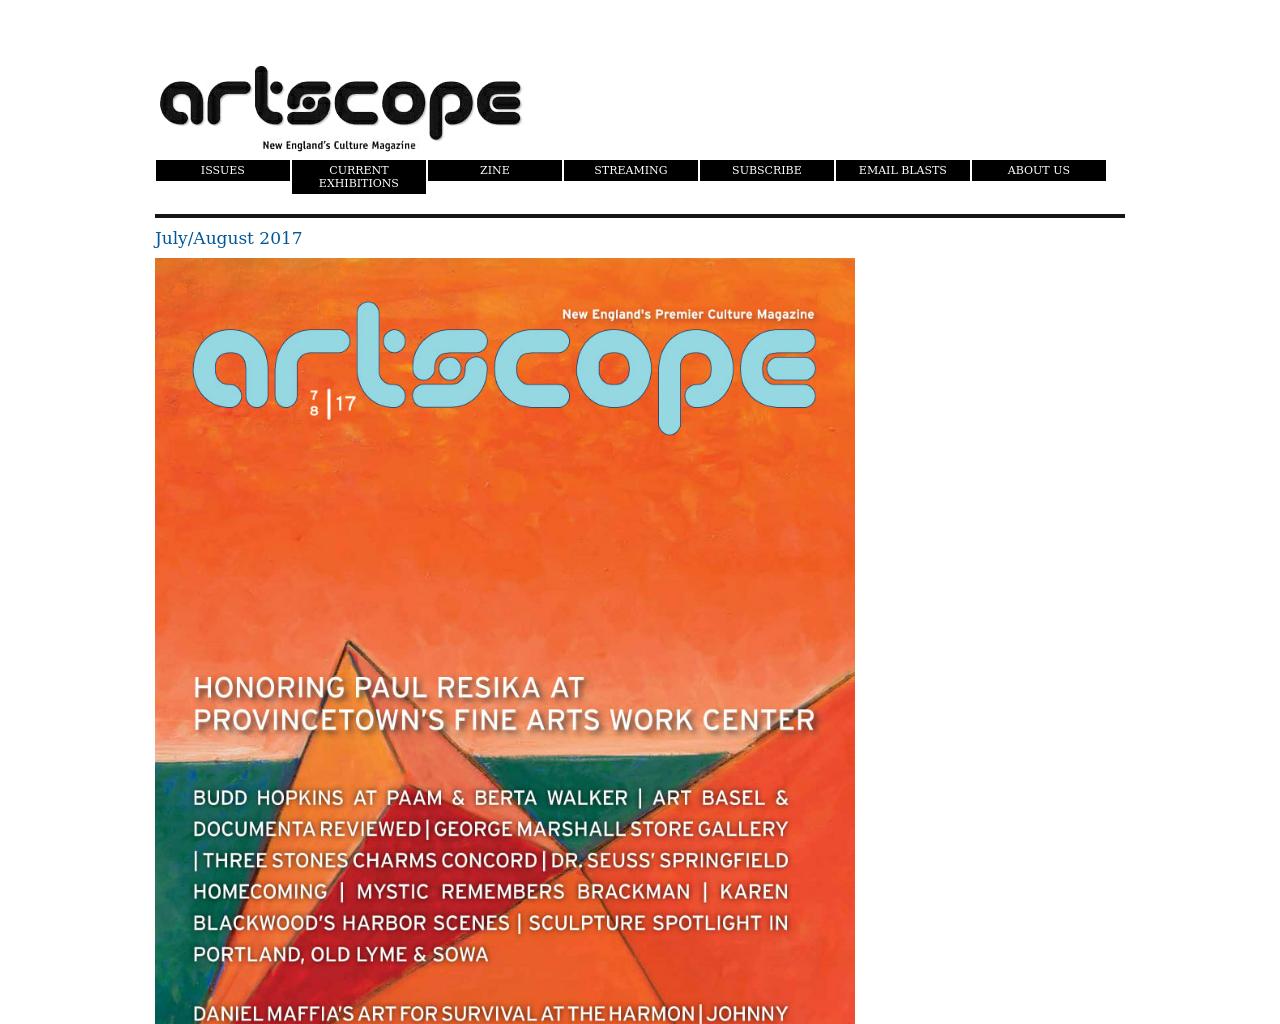 ArtScope-Advertising-Reviews-Pricing